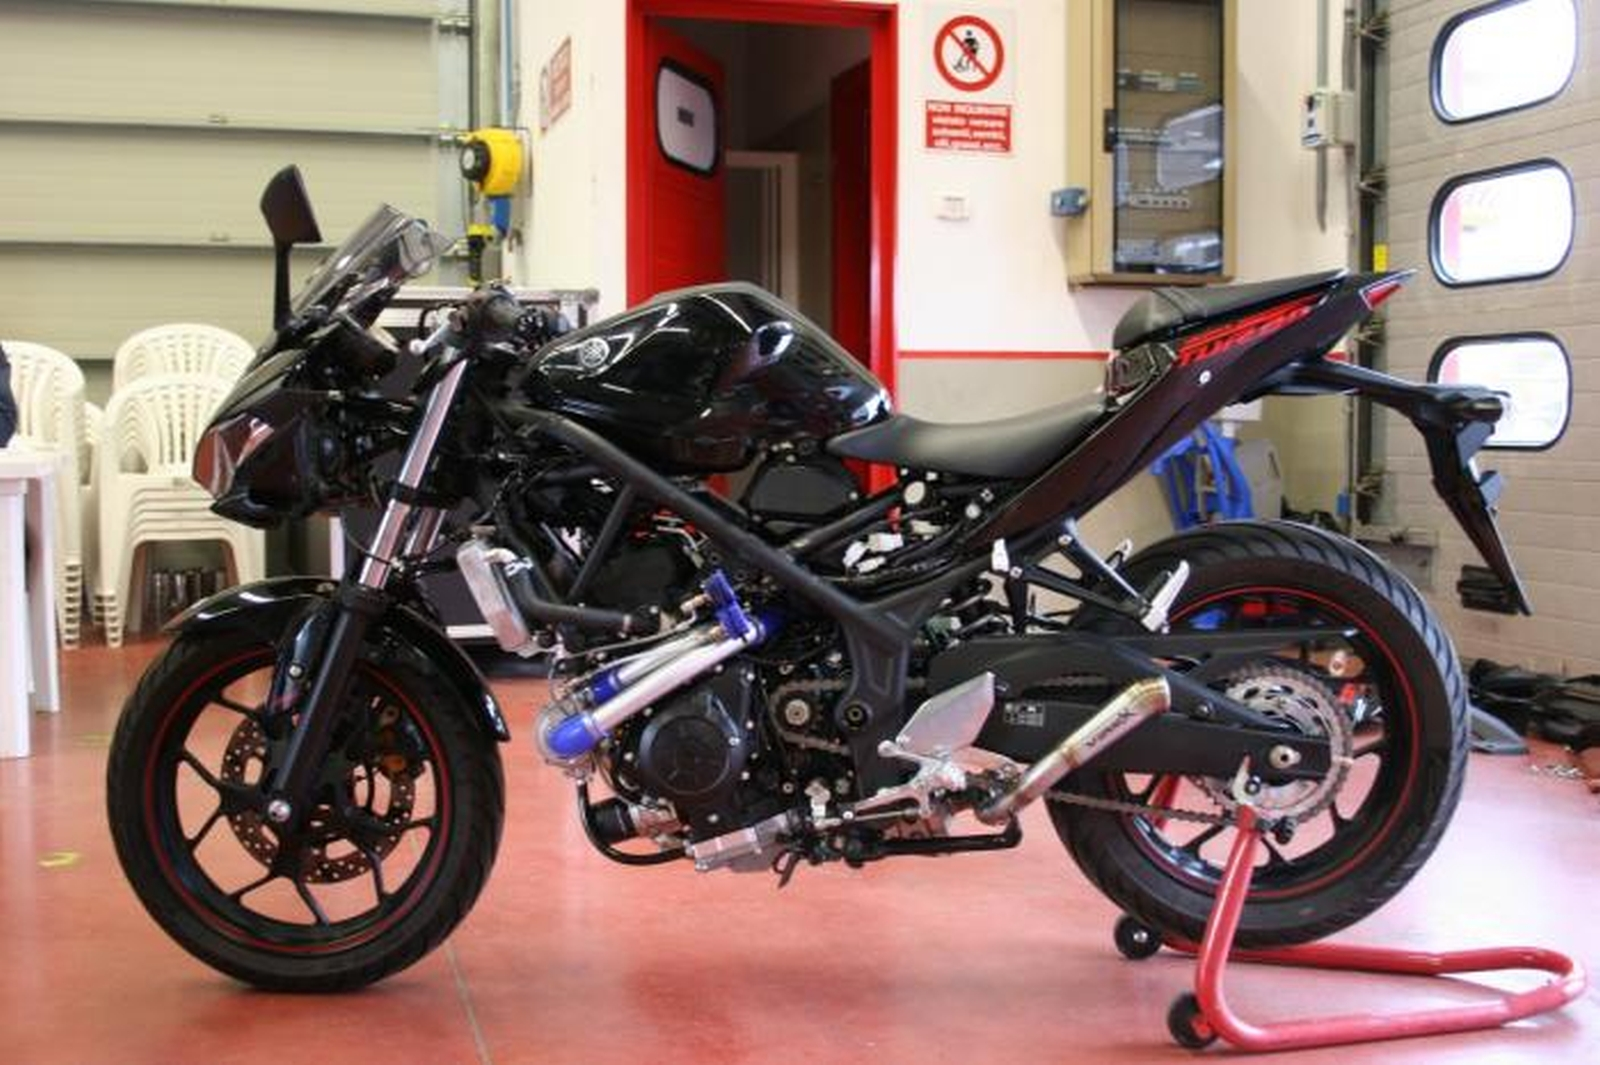 The Yamaha Yzf R3 Turbo Is A Modified Turbocharged Twin